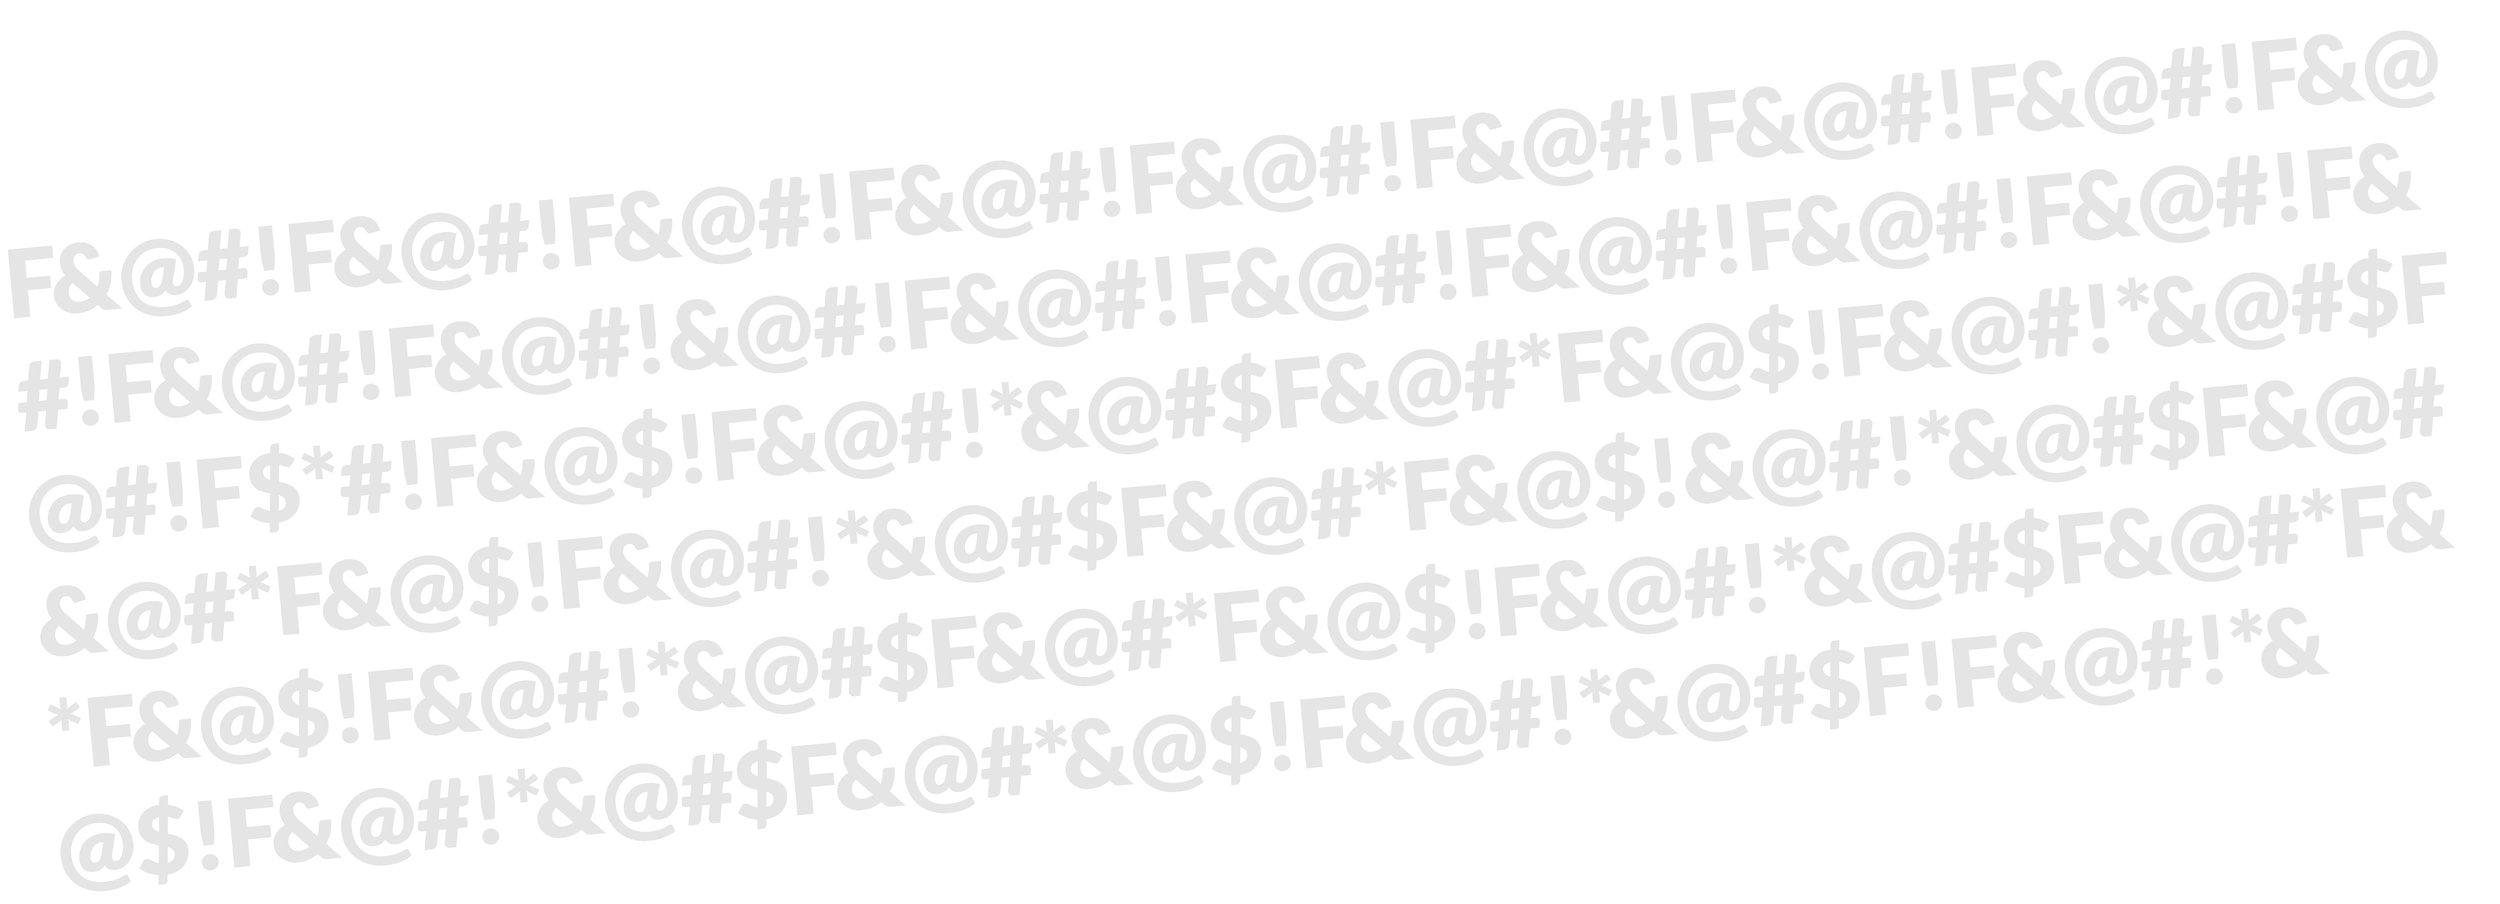 f-word-banner.jpg